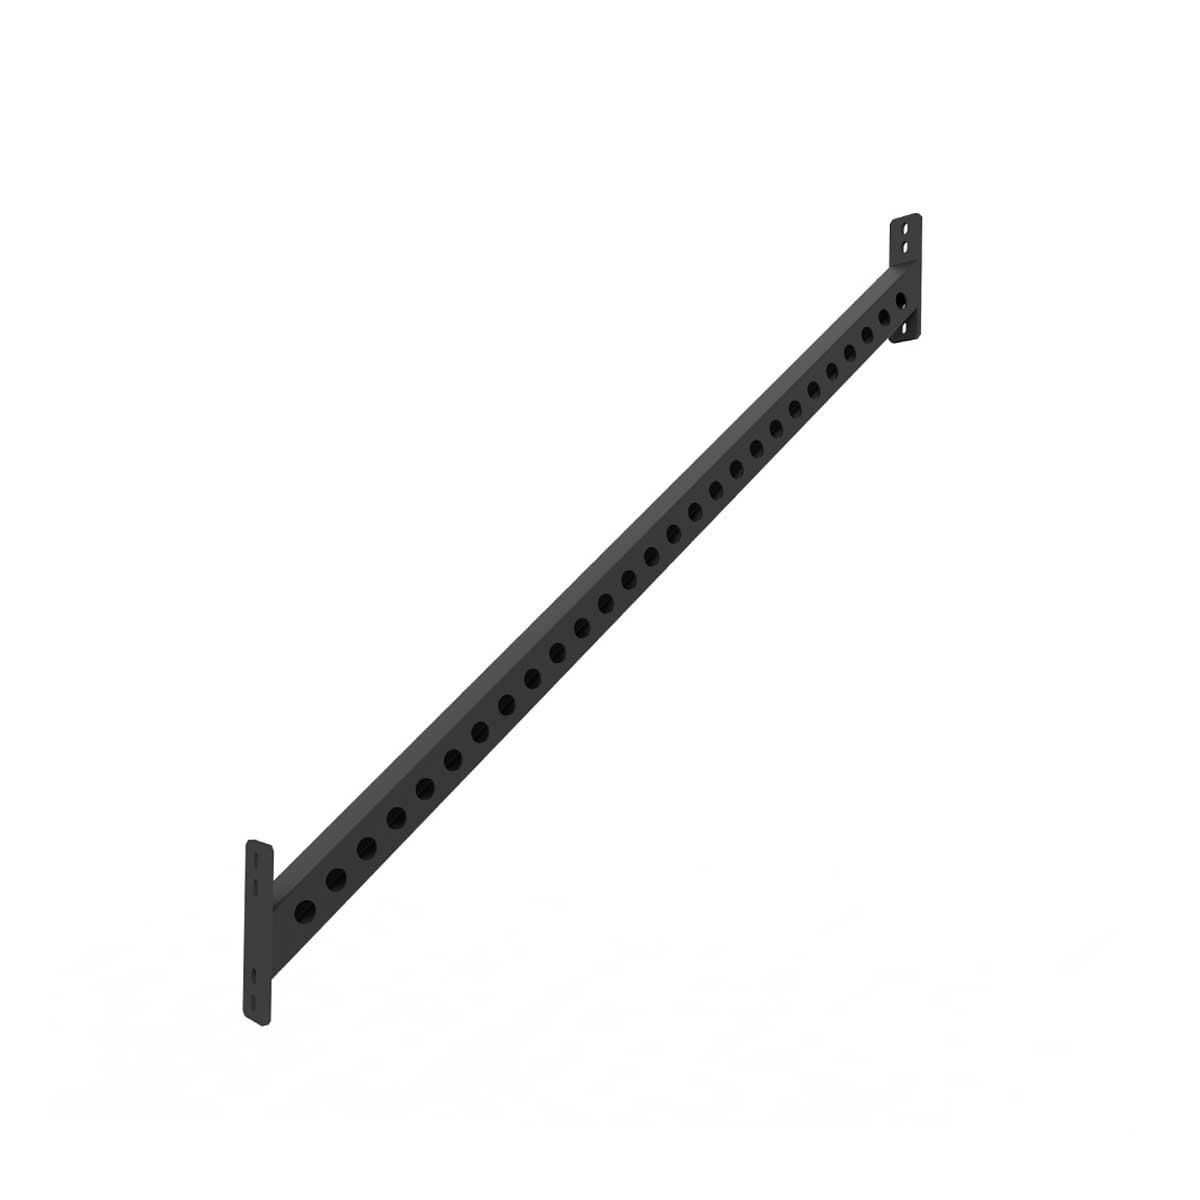 Square Angle Crossbeam - 4ft